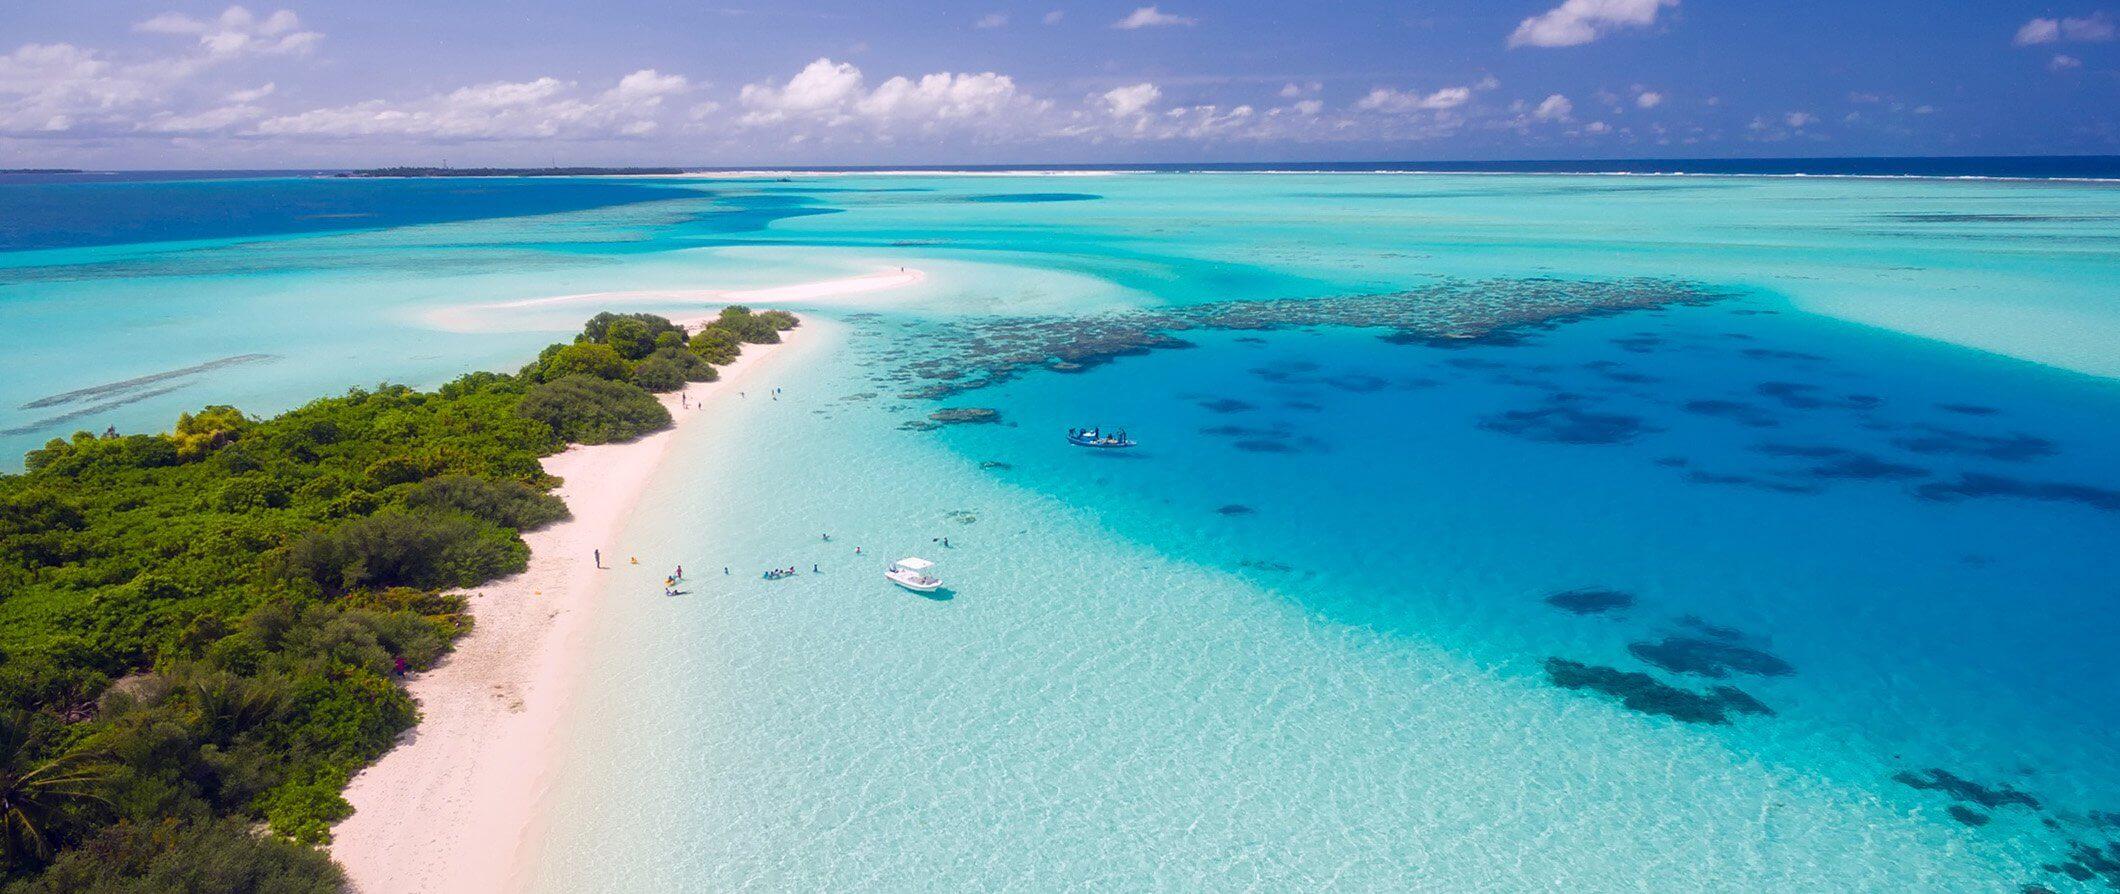 Maldives Dhoni Cruise